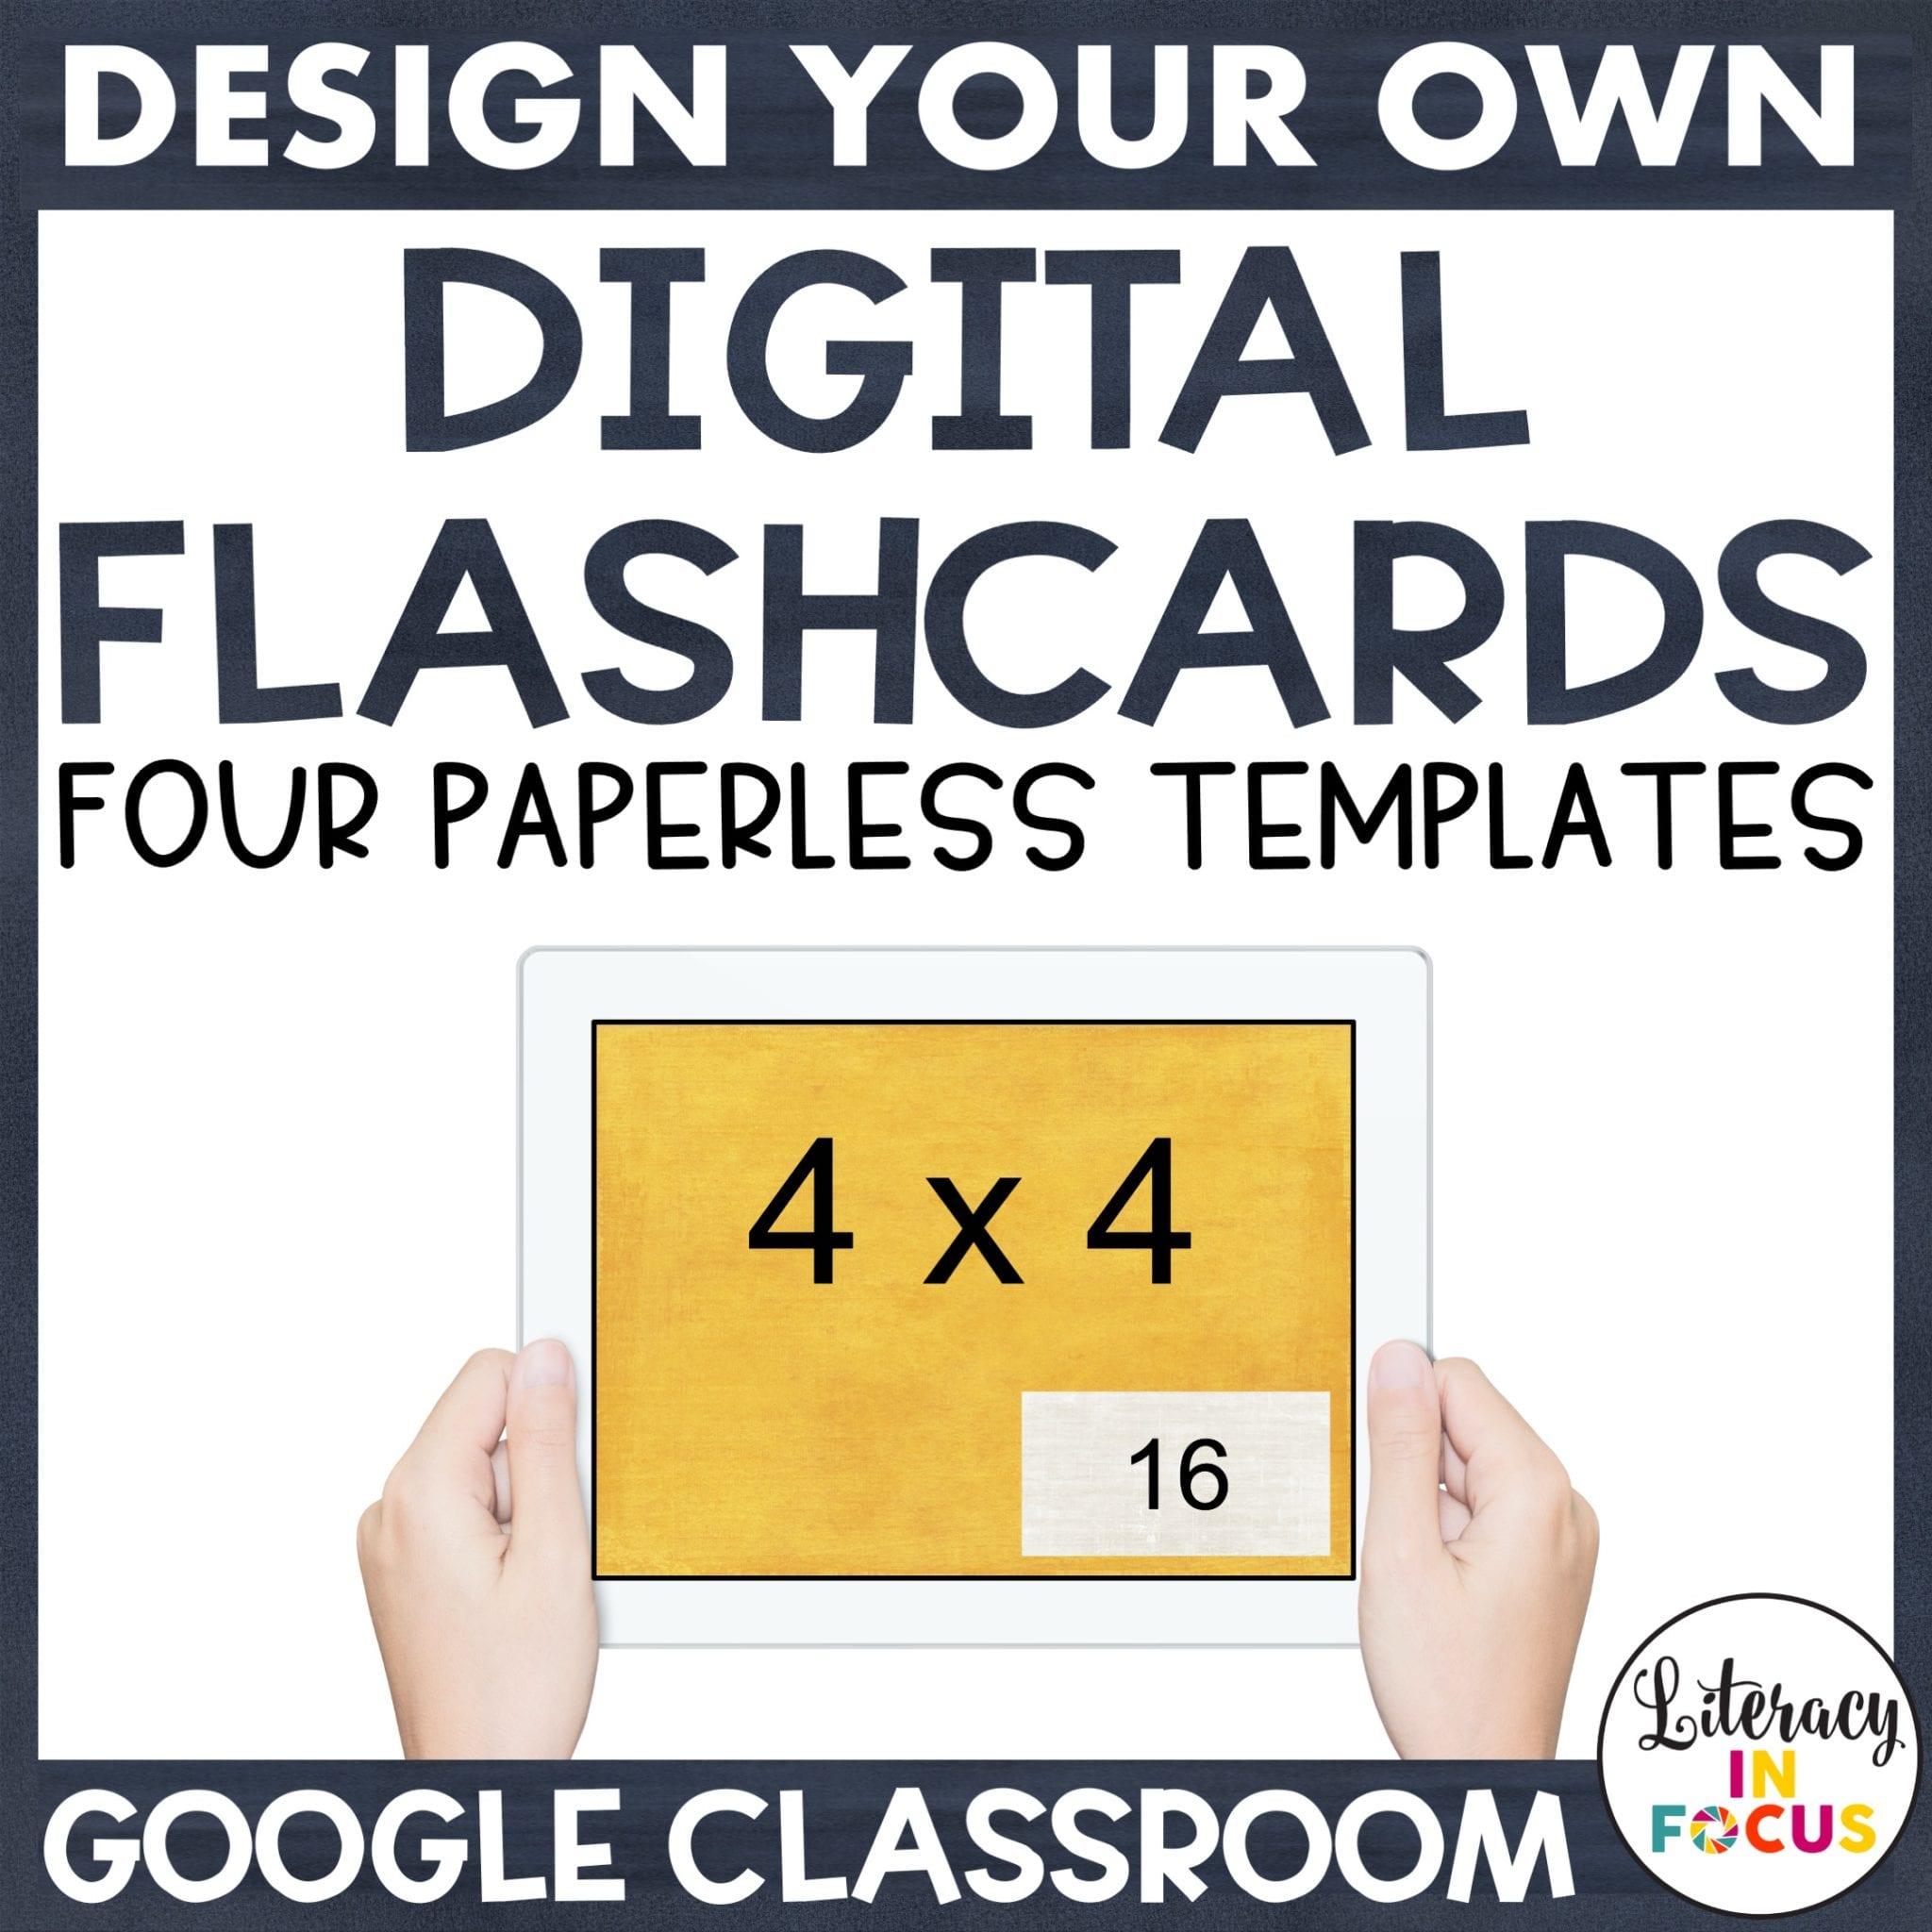 Digital Flashcards Templates